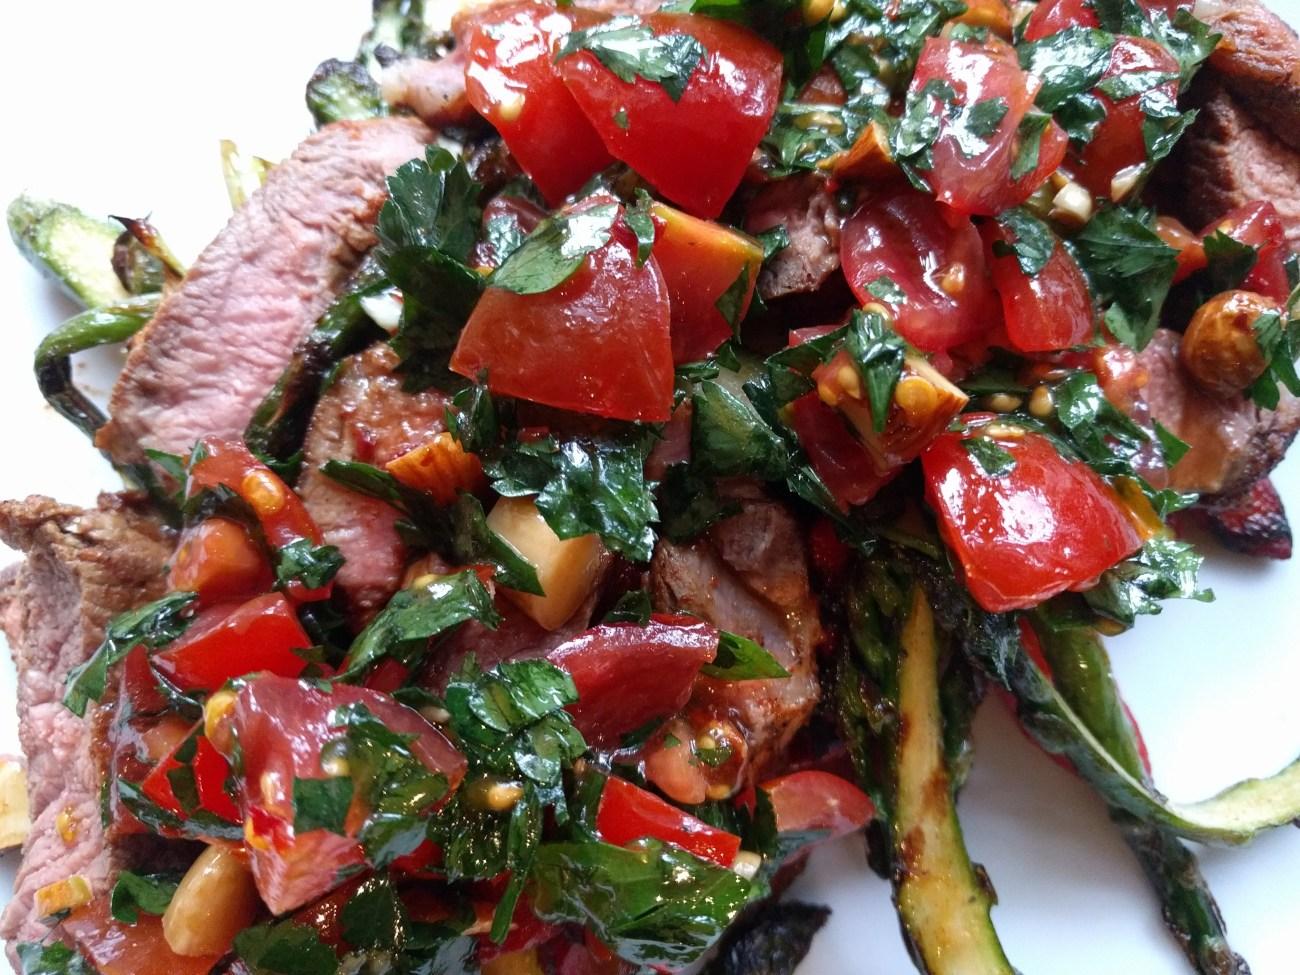 Seared steak with salbitxada sauce